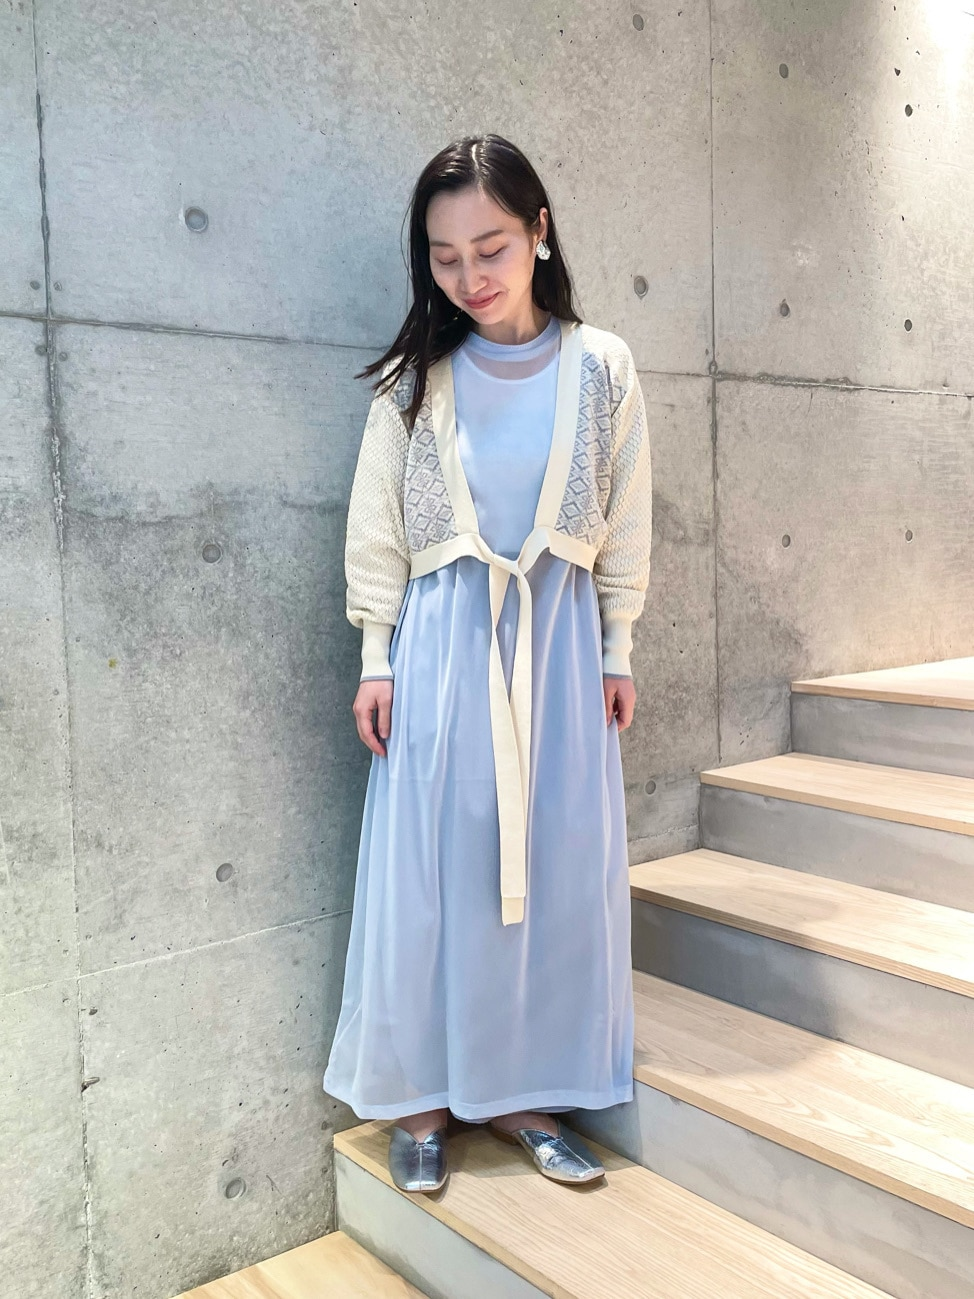 FLAT AMB 南堀江 2021.04.19